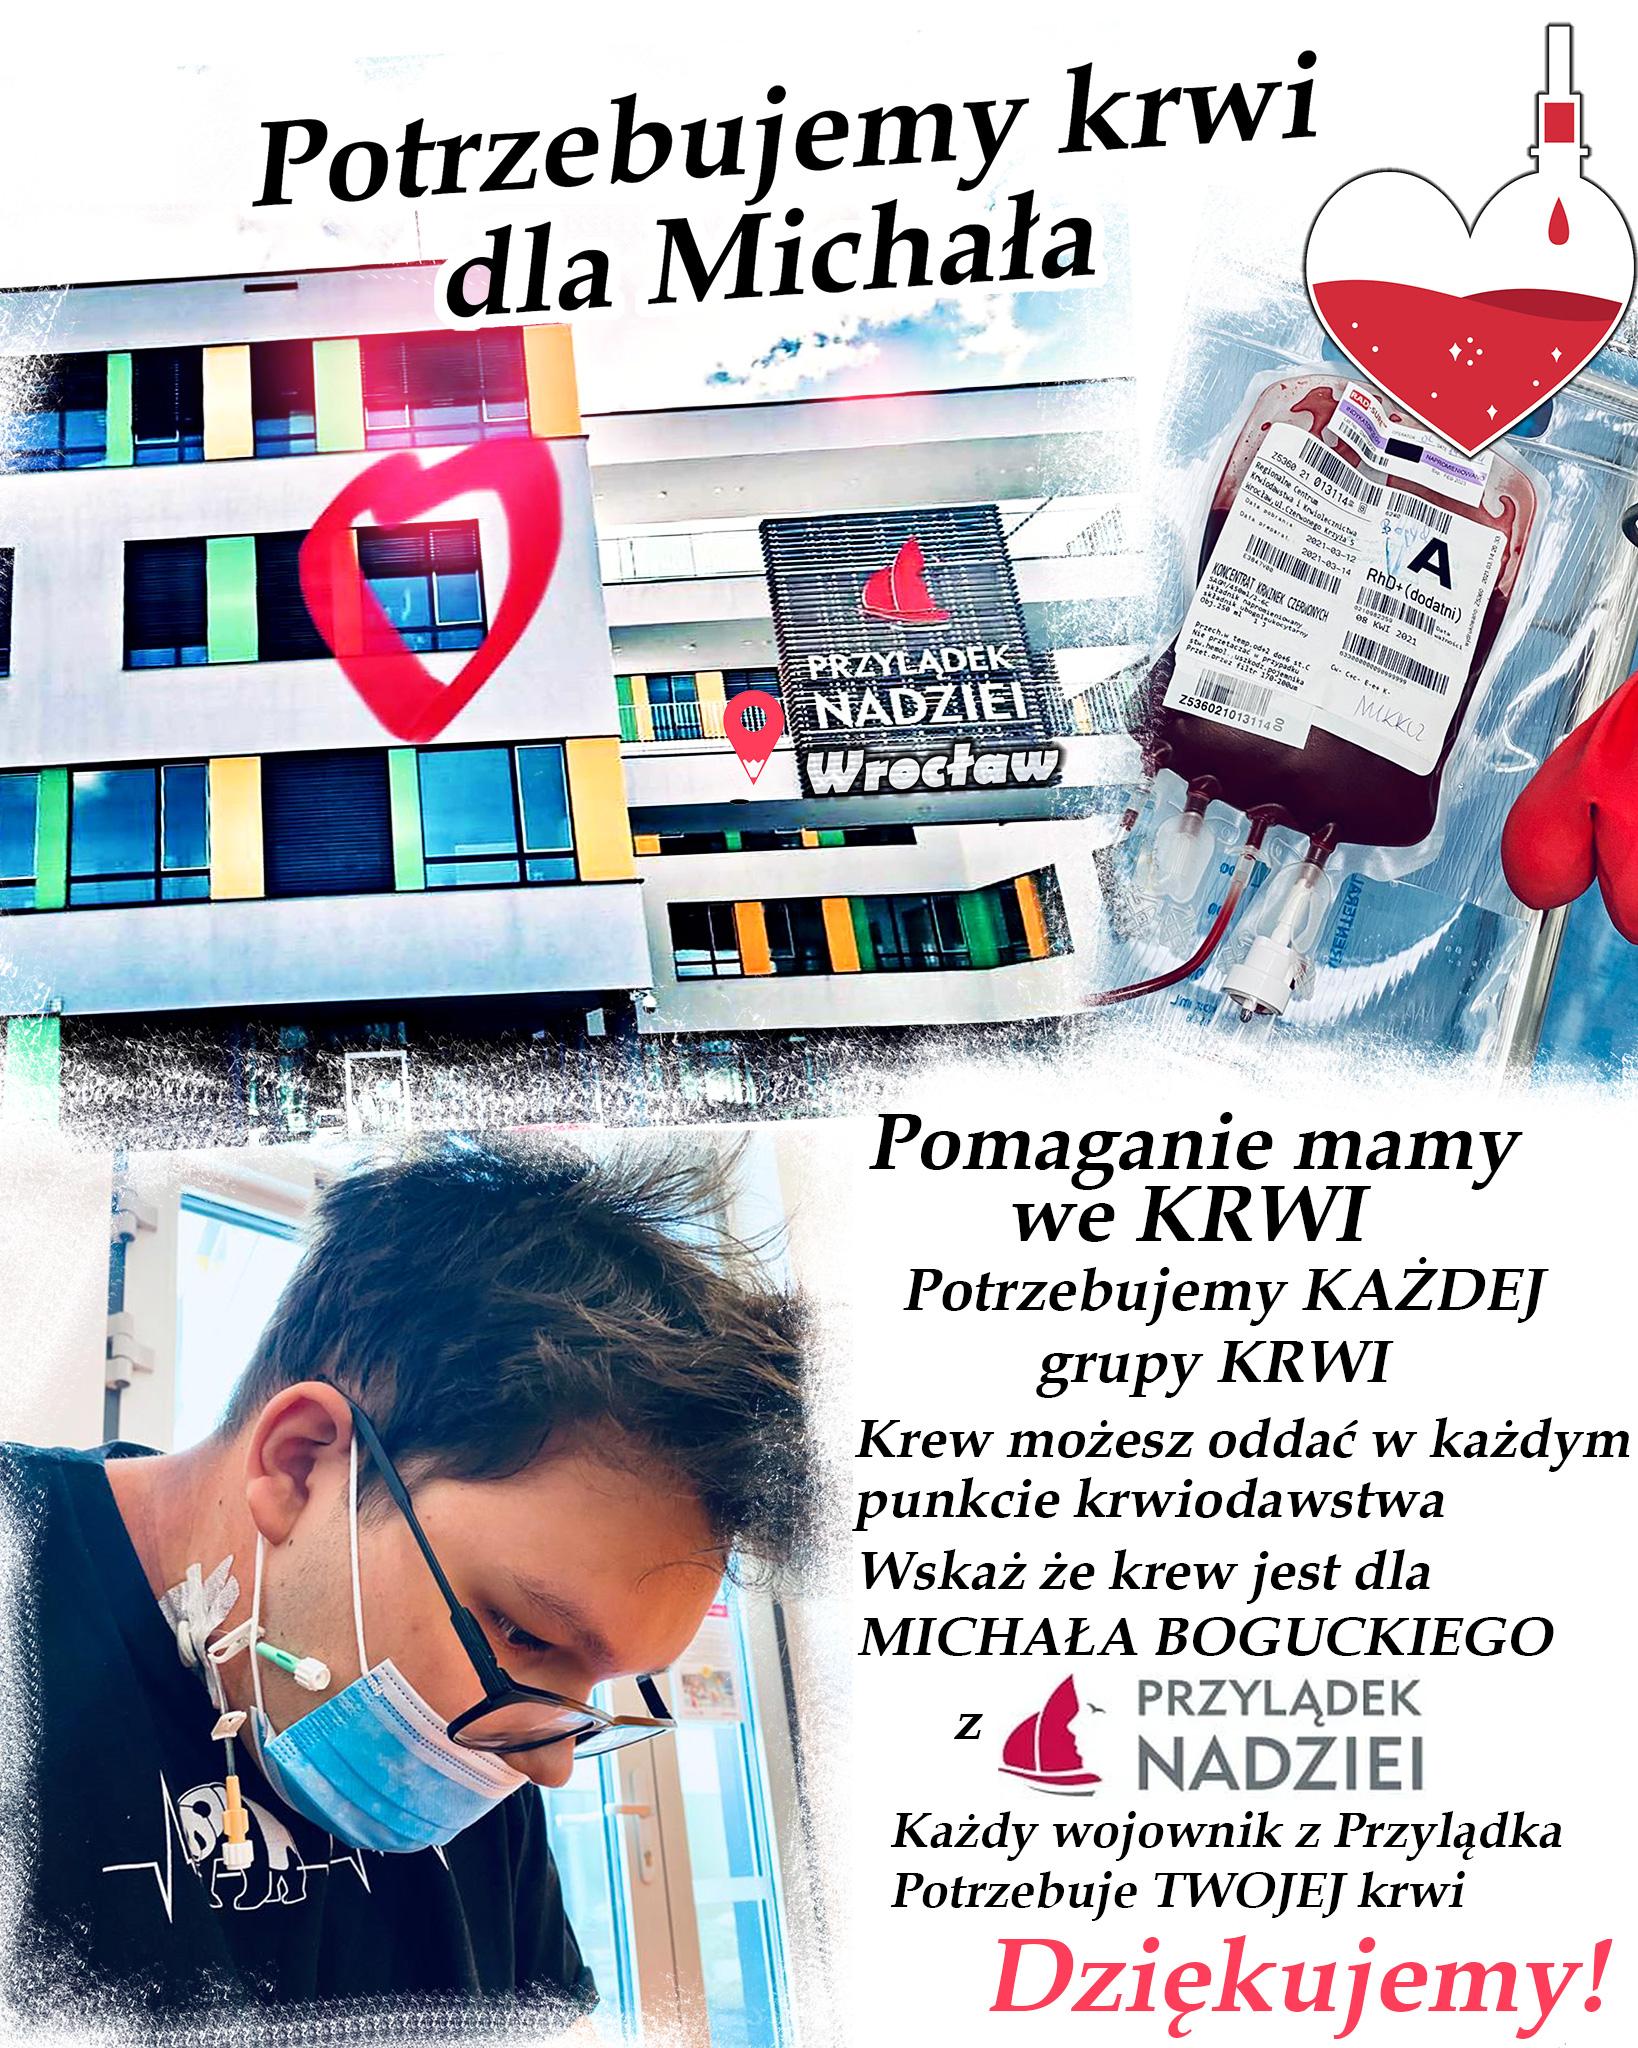 michal-bogucki-3-media-spolecznosciowe